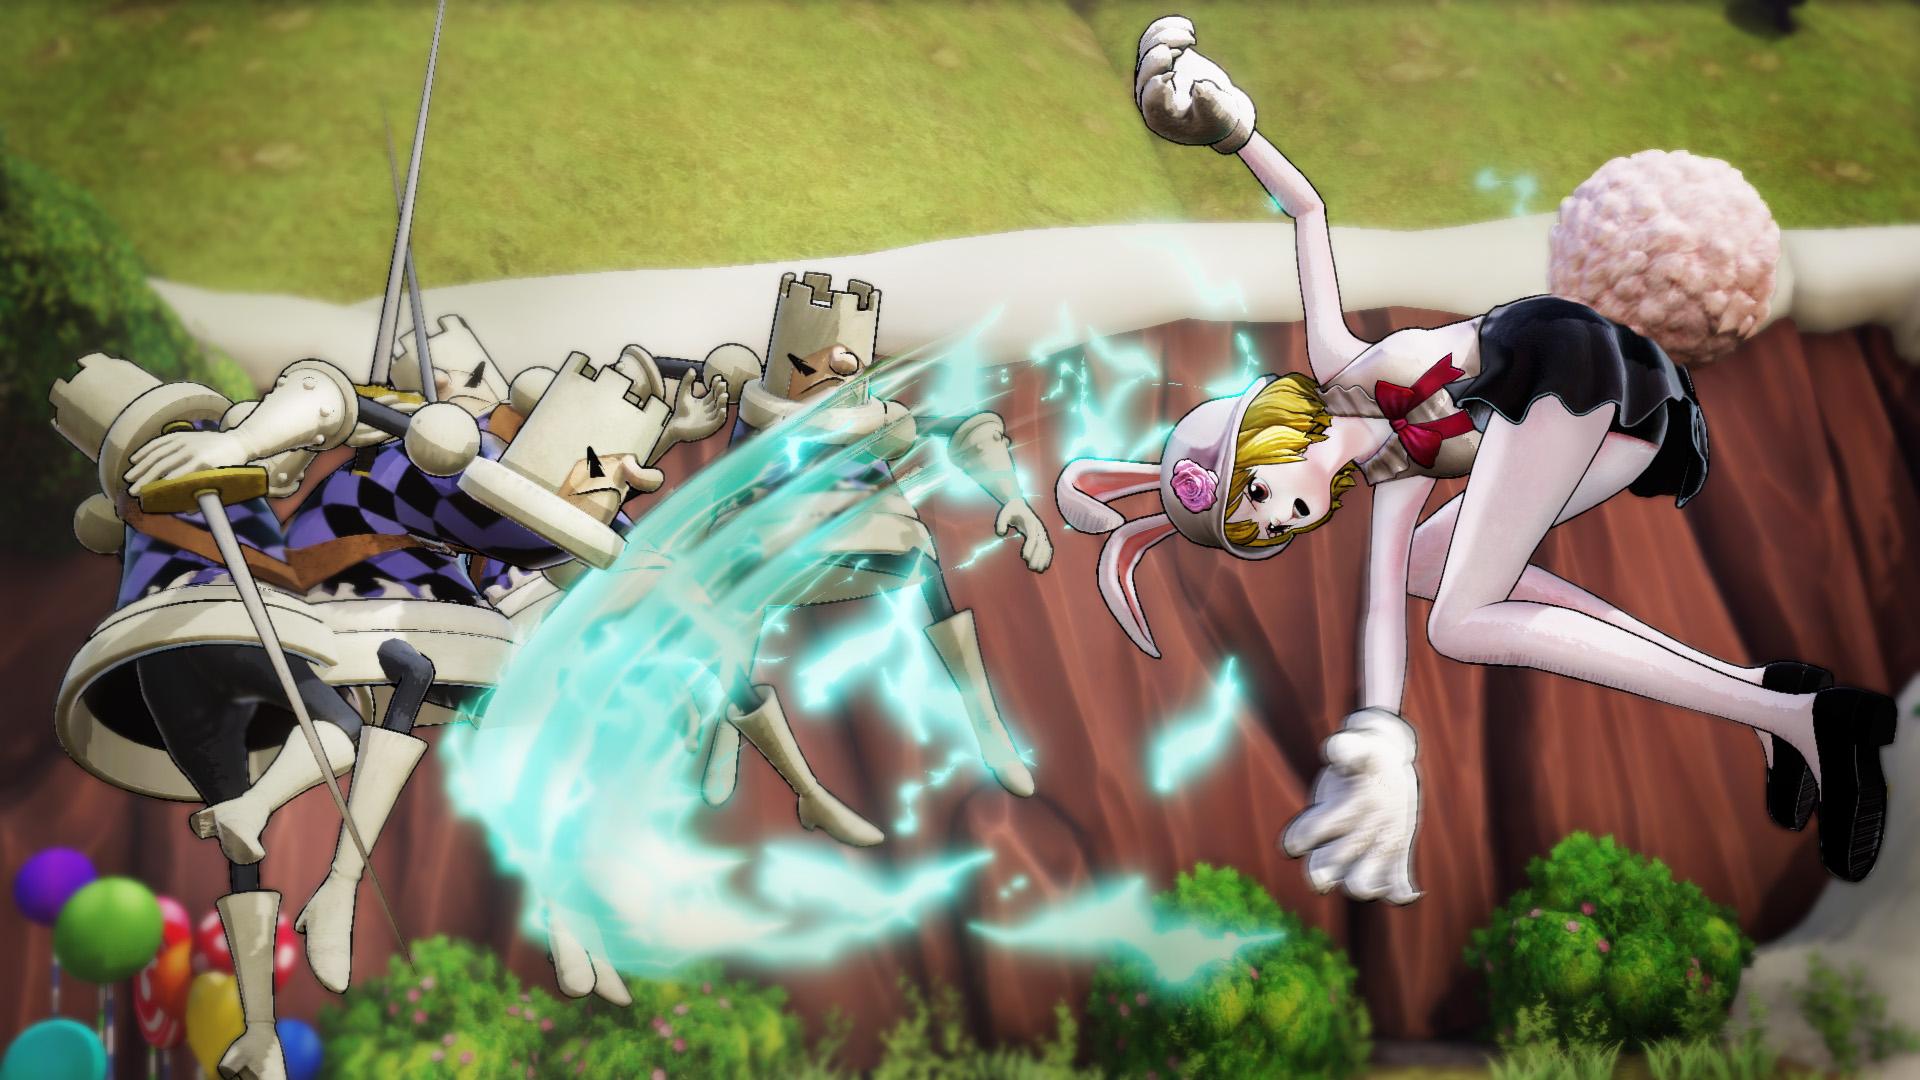 One_Piece_Pirate_Warriors_4_-_Screenshot_3_1568189175.jpg